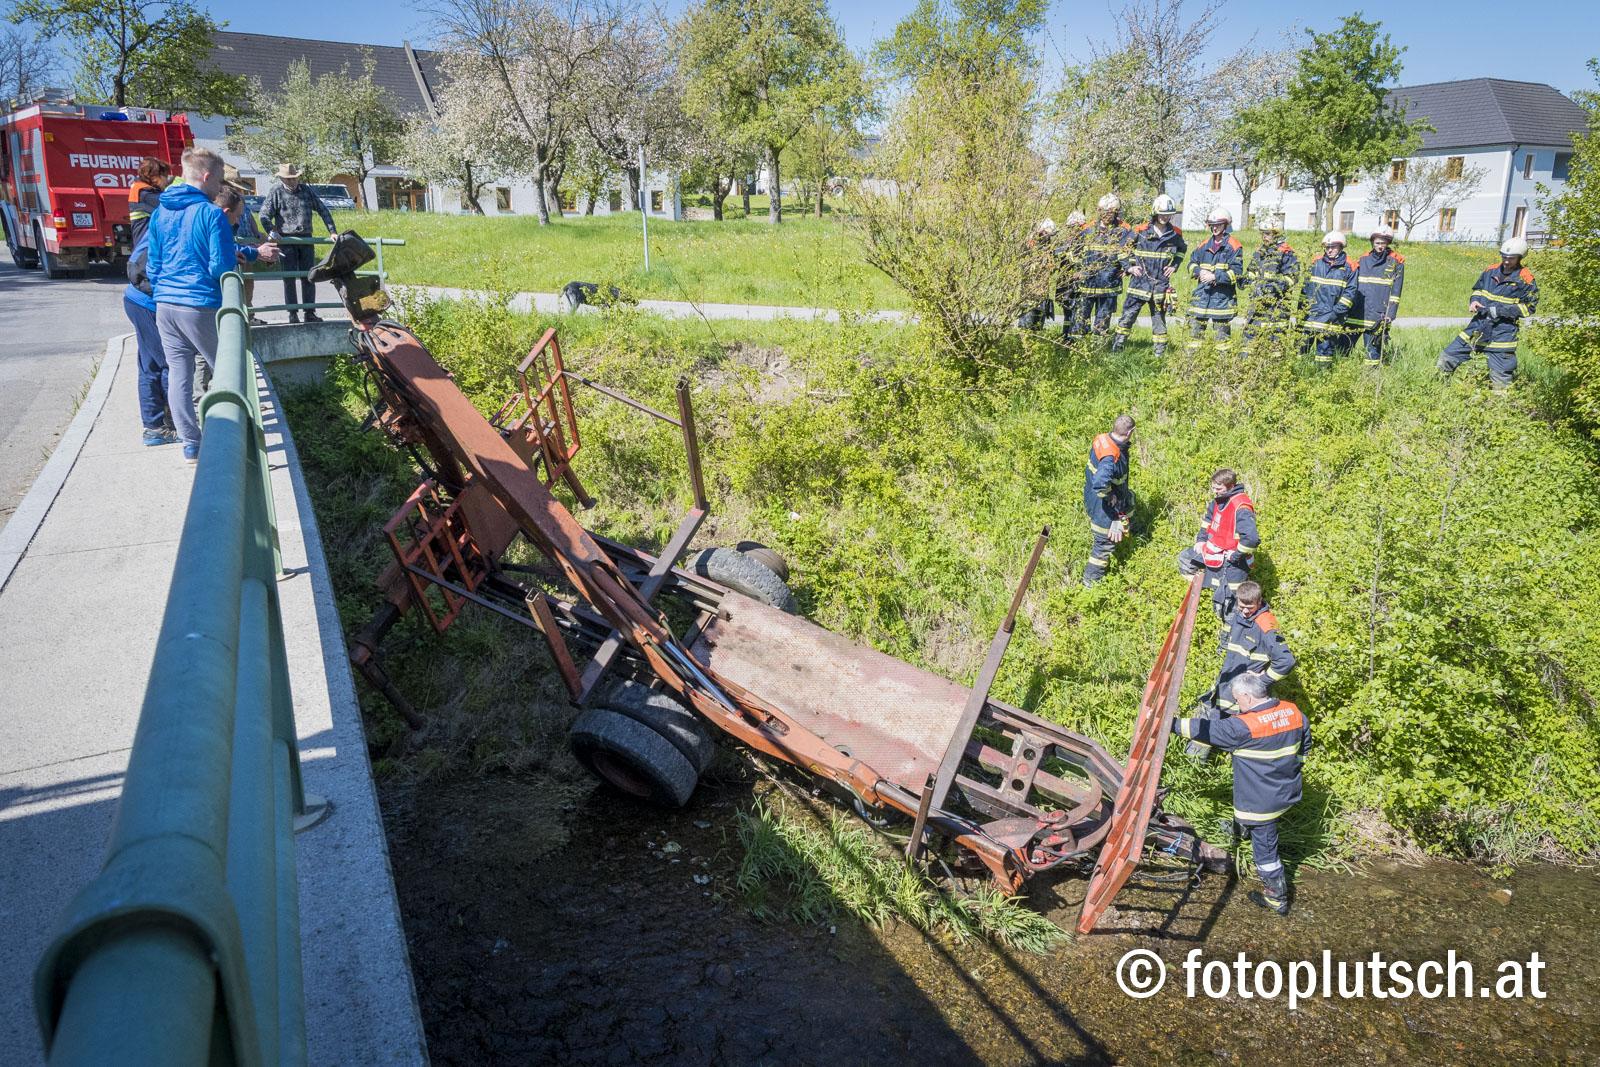 Unfall_mit_Traktor _in_großeigen_Mank_30042016_fotoplutsch 4_